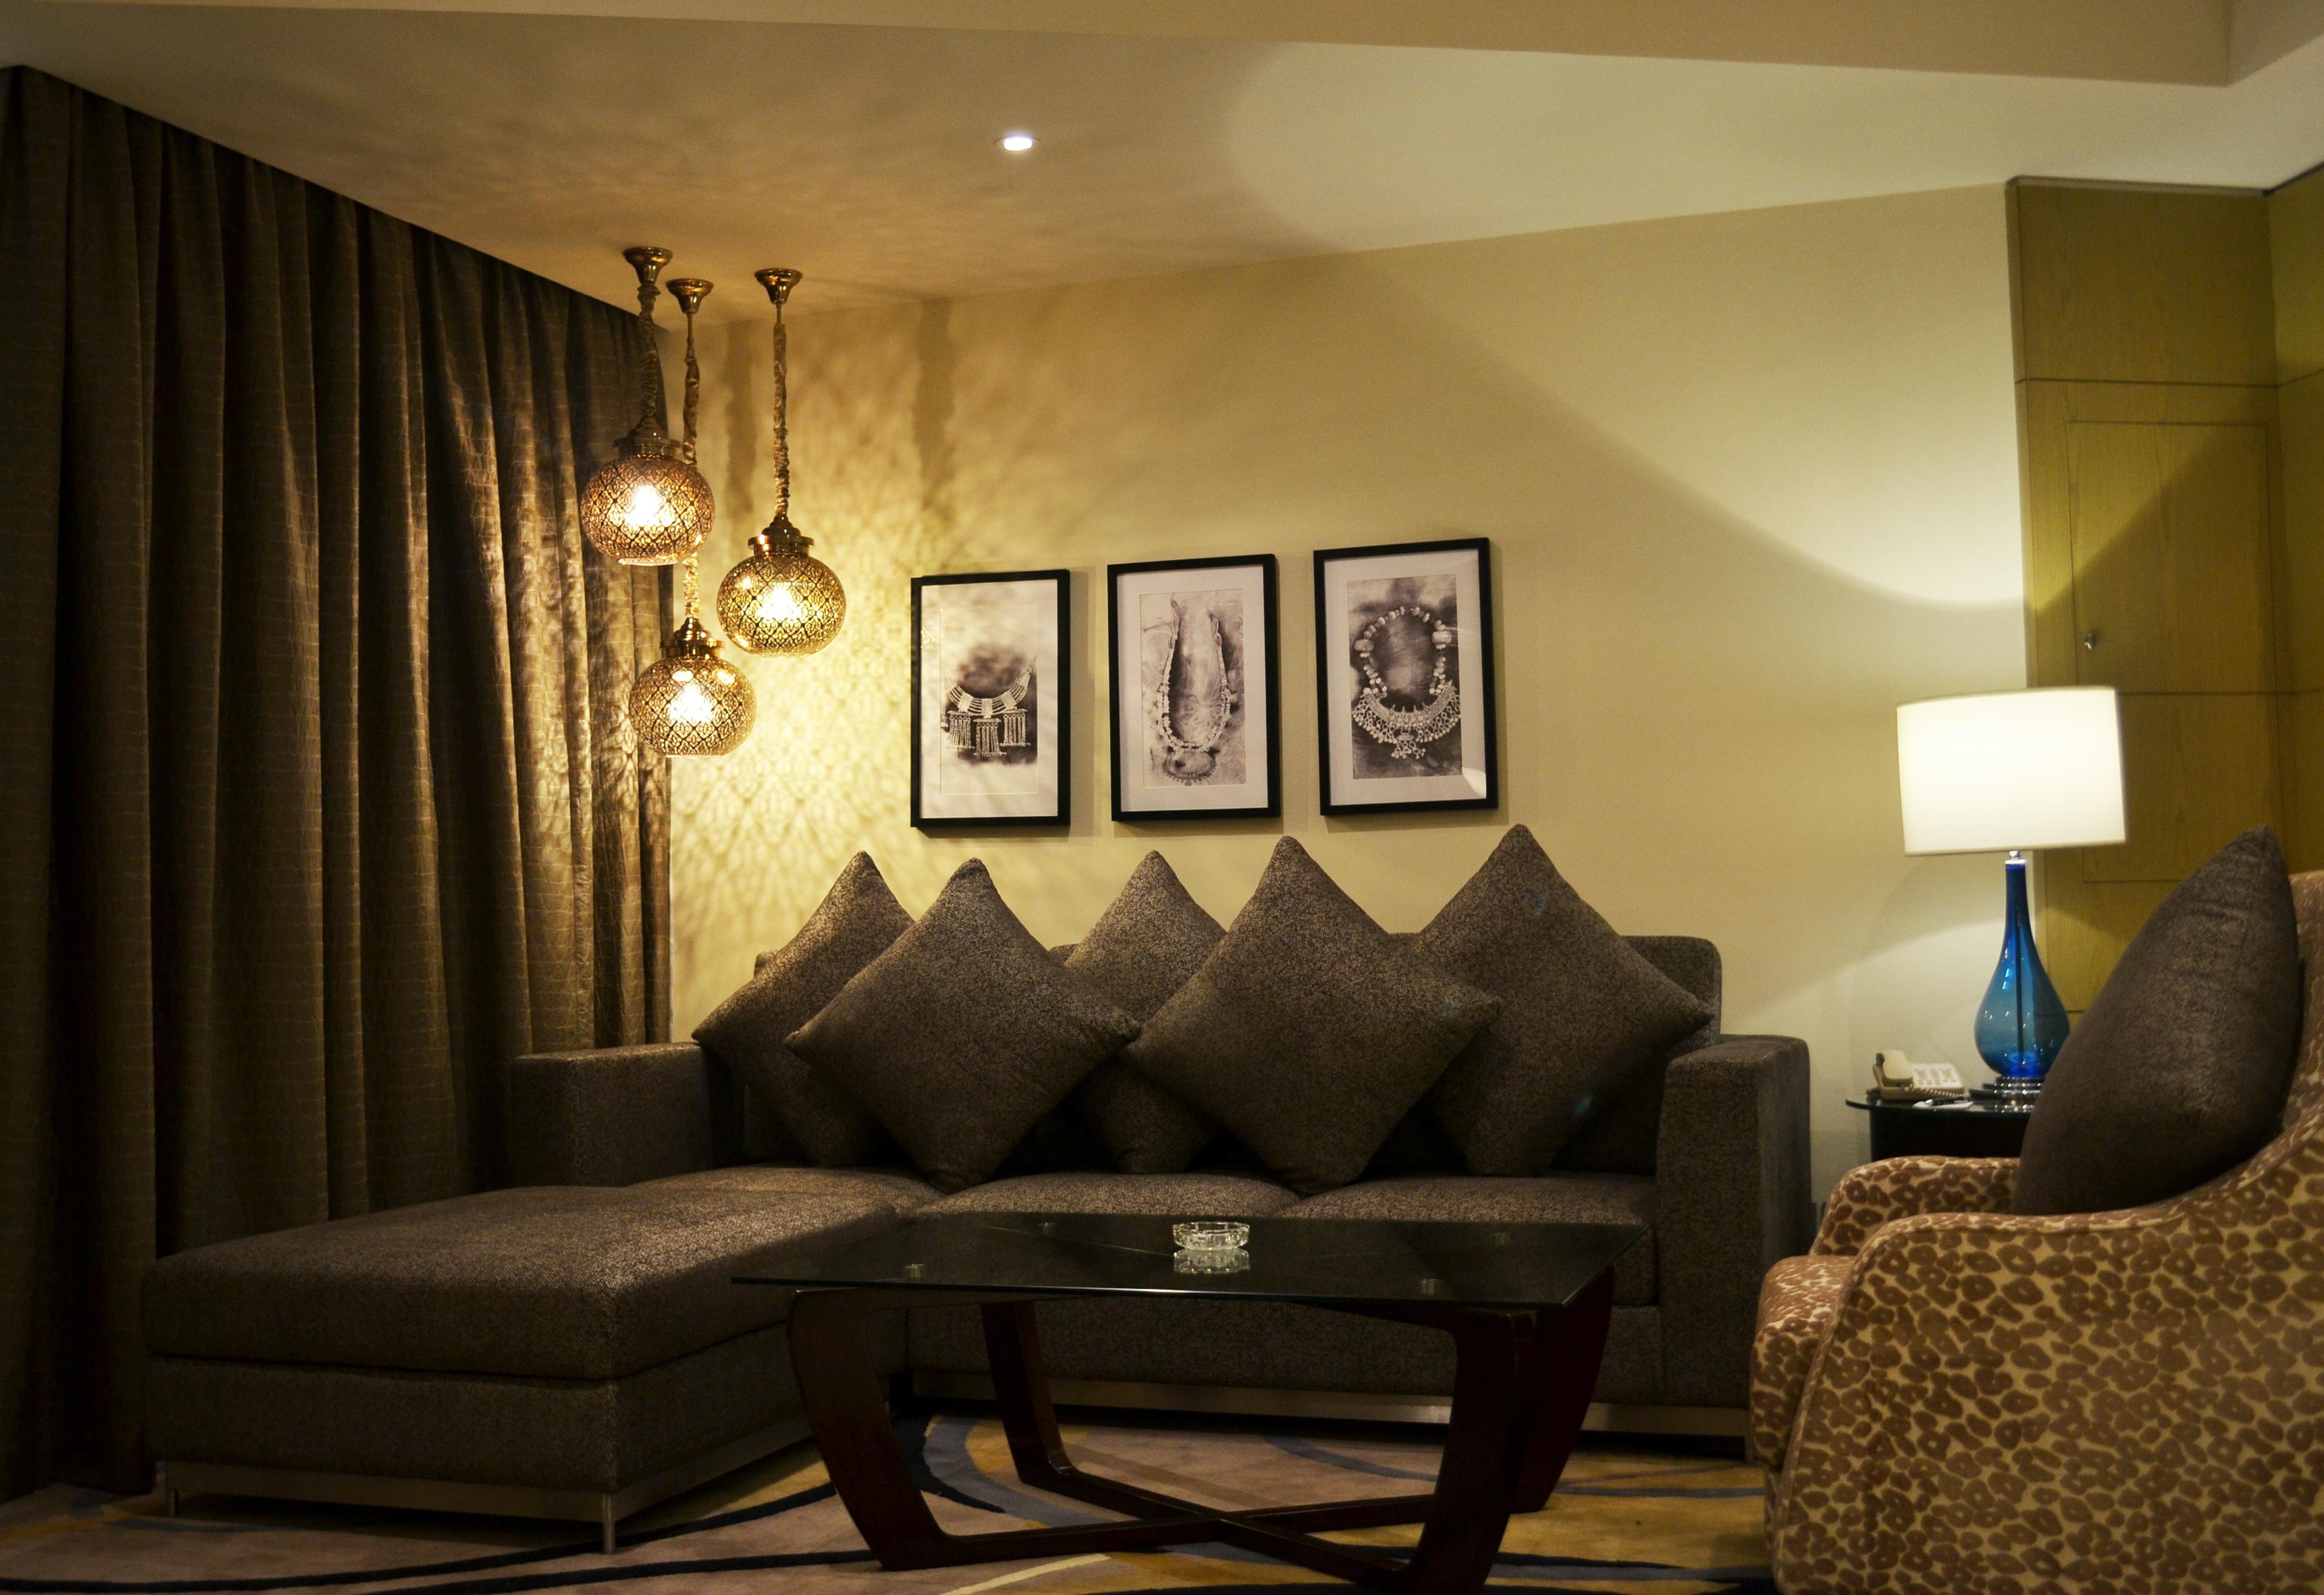 Gulf Hotel u2013 Manama Bahrain & Light Vision LLC - Creative Lighting Solutions - Lighting Company ... azcodes.com